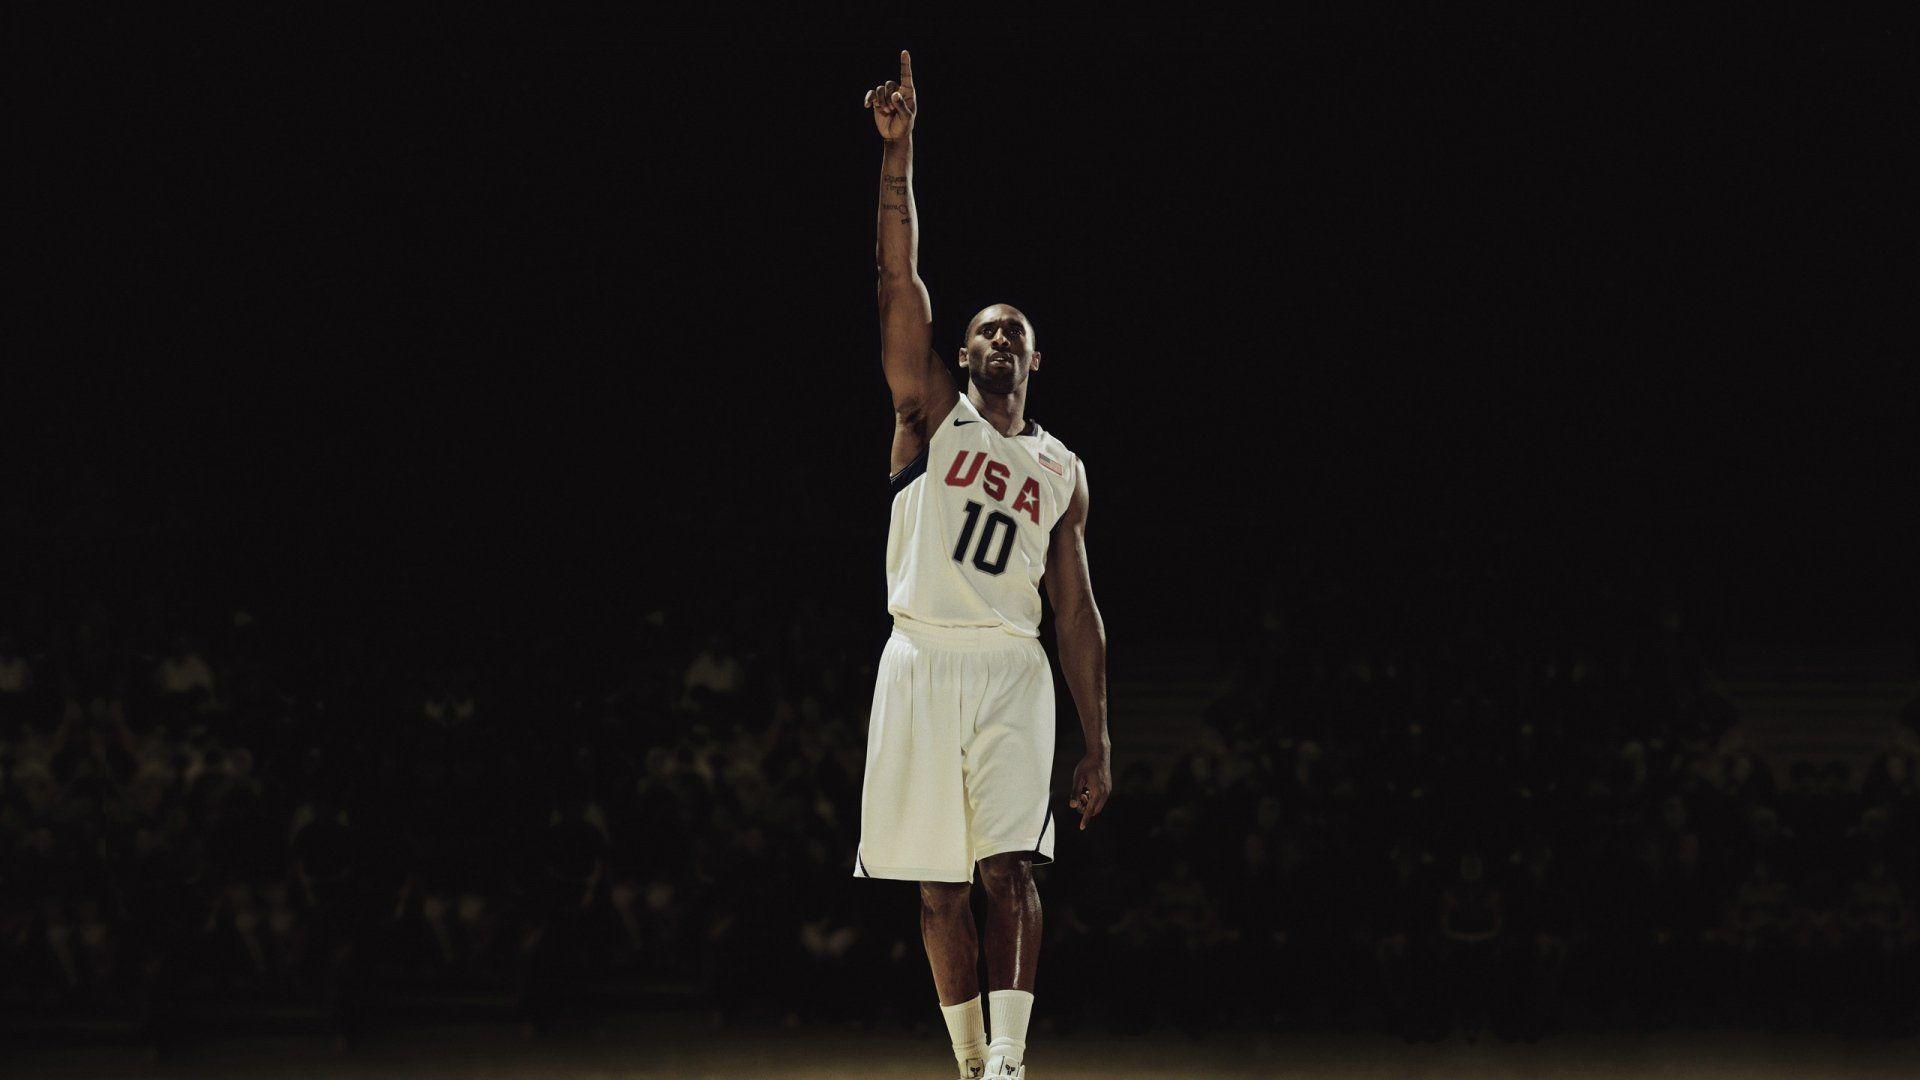 Kobe Bryant Wallpapers Hd Resolution Desktop Wallpaper Box Kobe Bryant Wallpaper Kobe Bryant Kobe